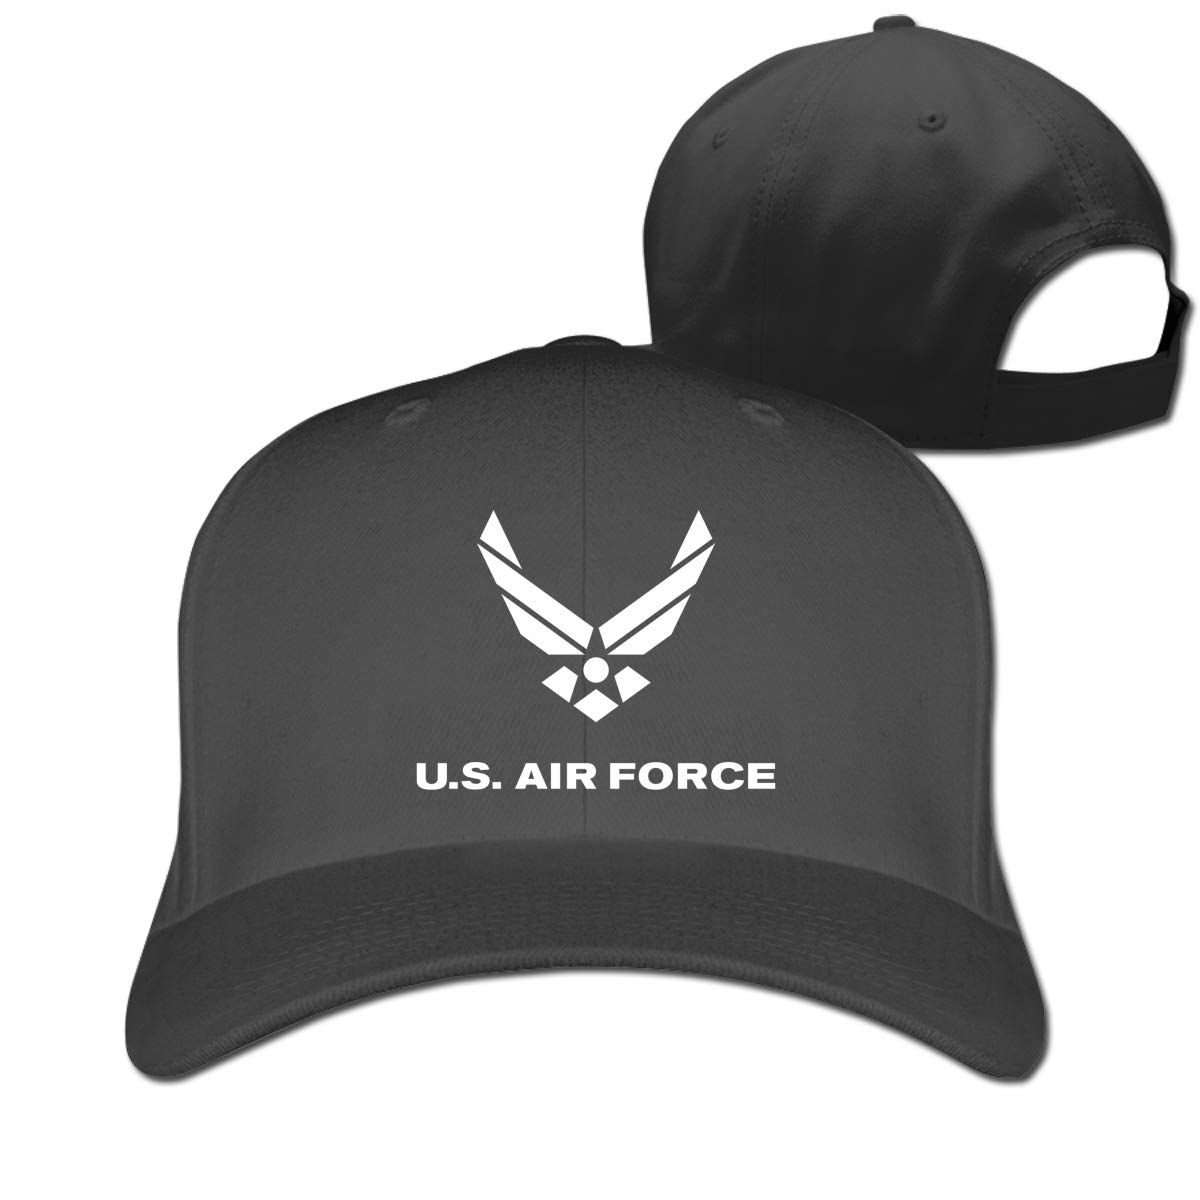 US Air Force Logo Fashion Adjustable Cotton Baseball Caps Trucker Driver Hat Outdoor Cap Black